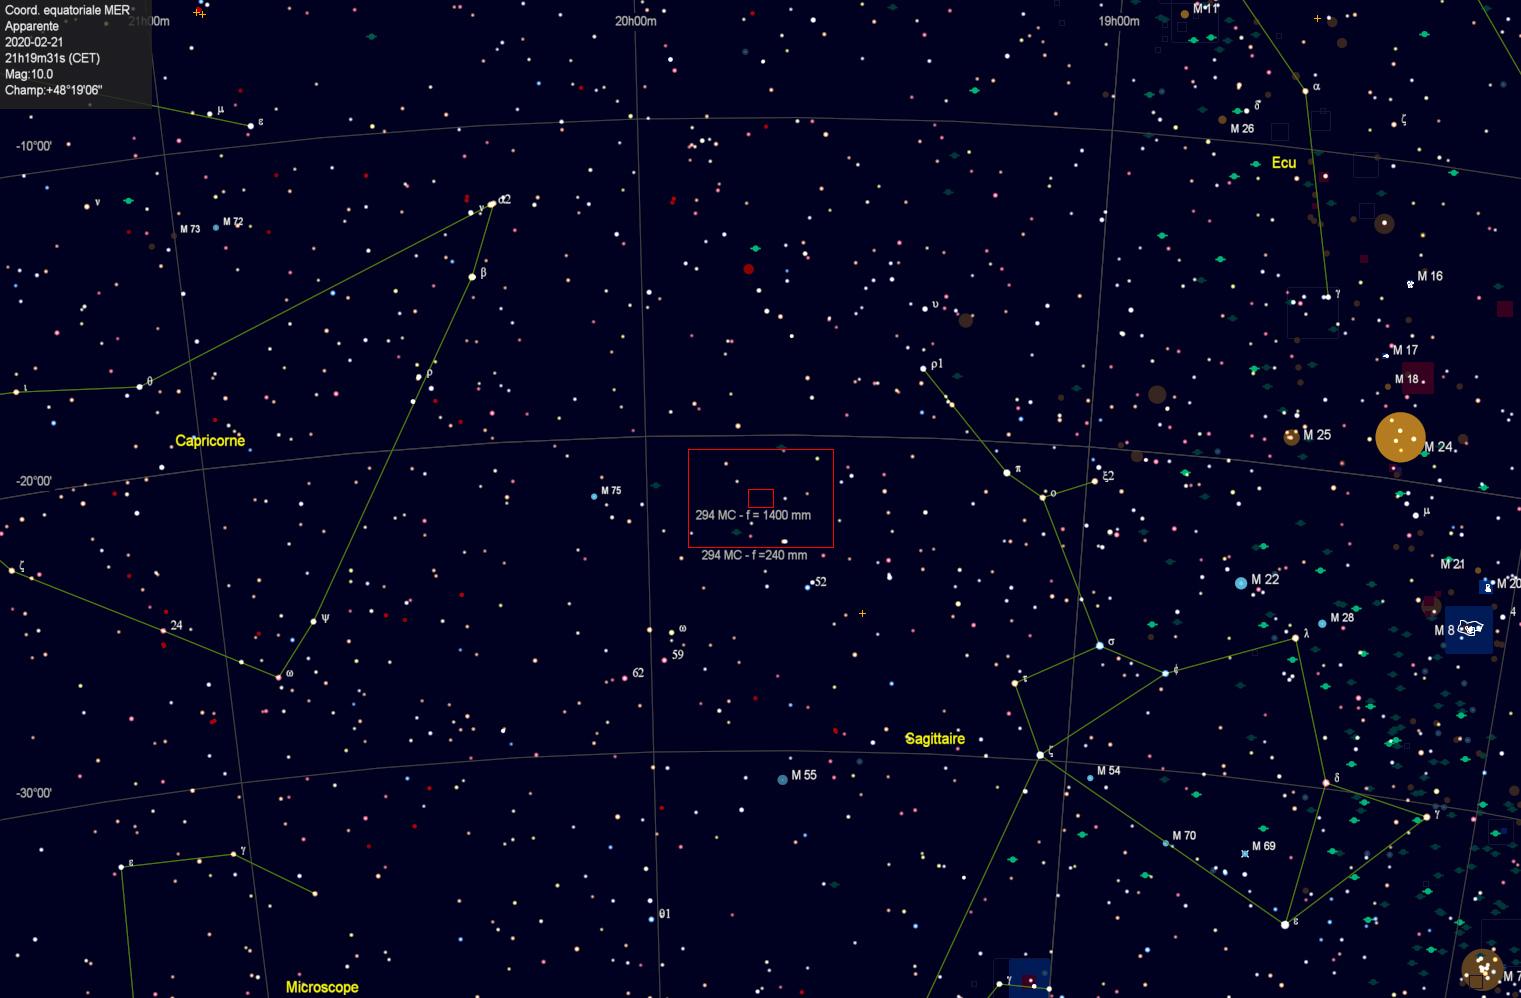 zzz_Pluton_22-02-2020.jpg.f9fa9b1d7af8b4b369317f5e805d3042.jpg